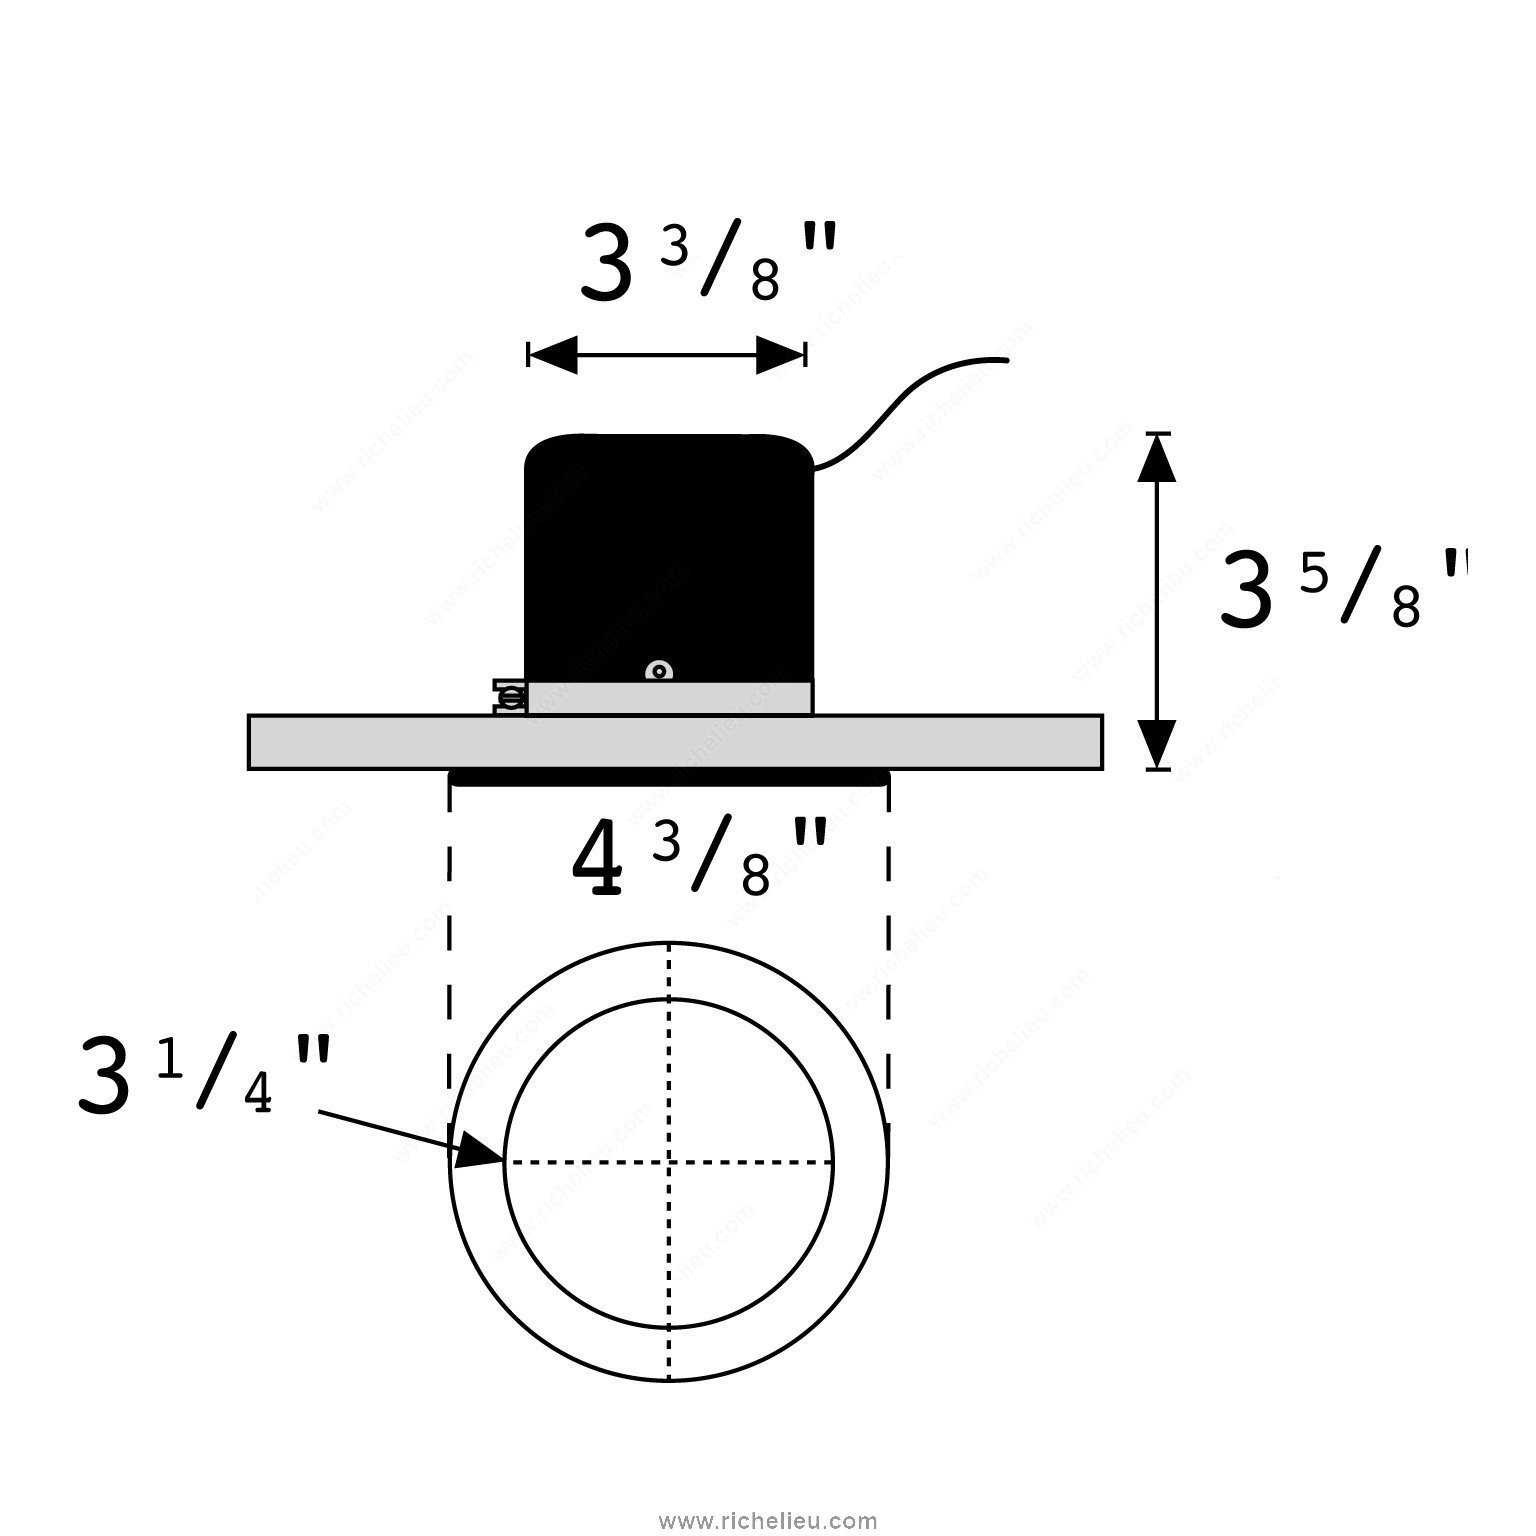 Capsylite 50 W Recessed Halogen Lamp